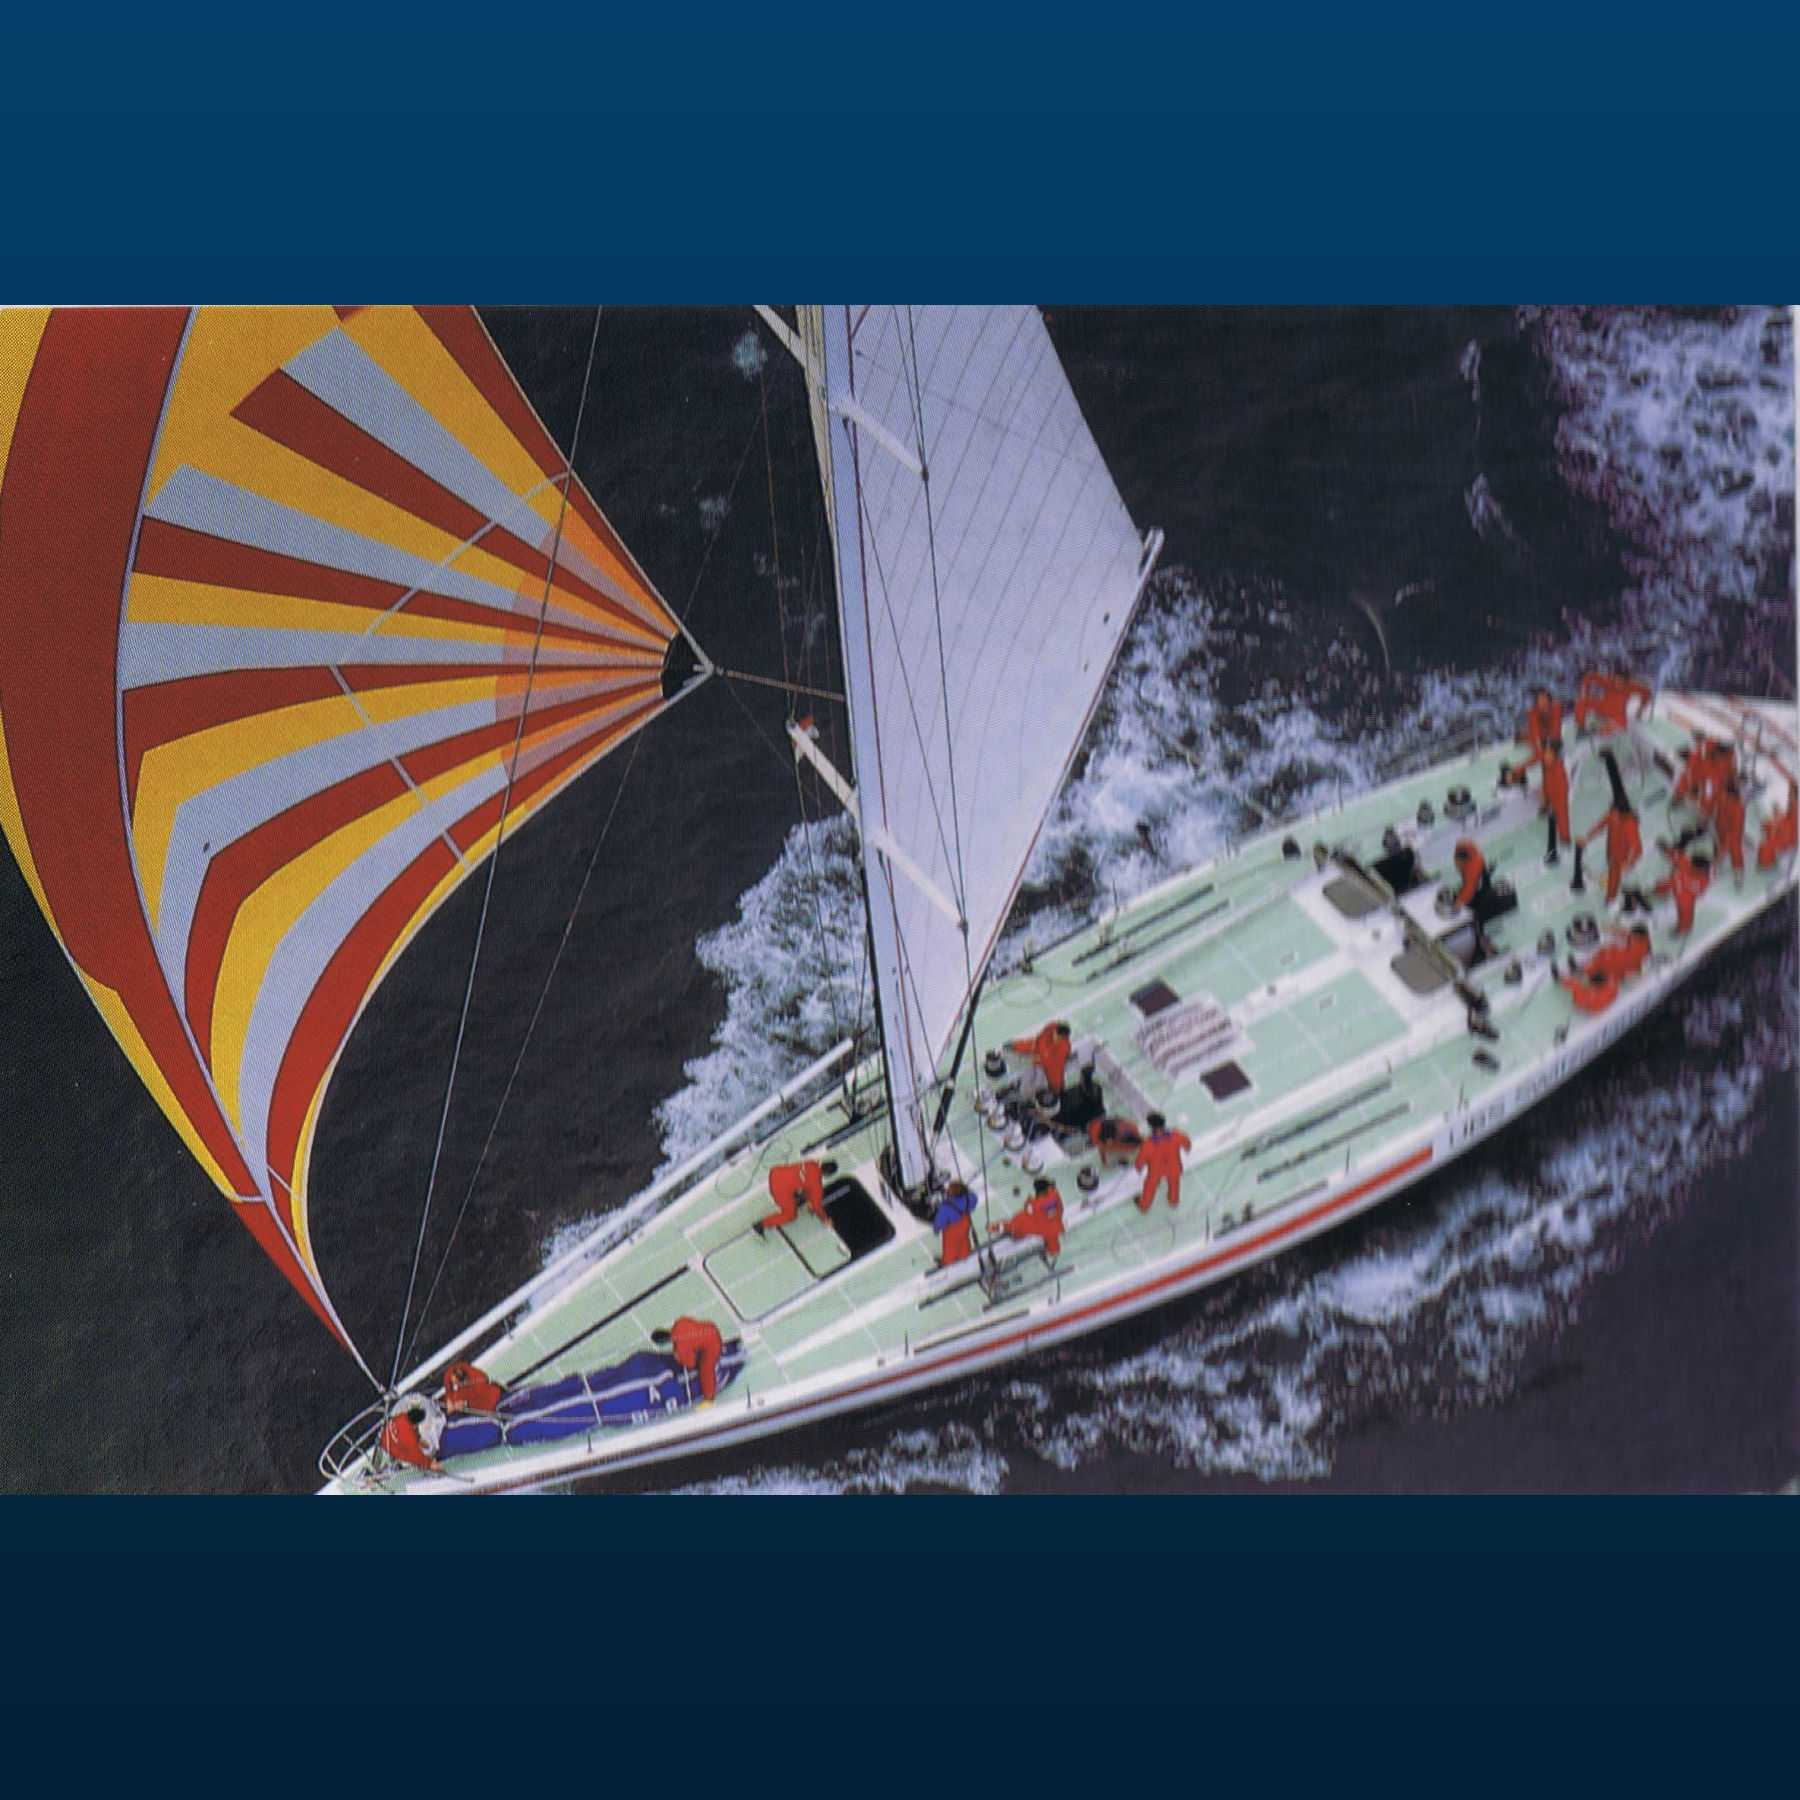 DECISION :: UBS Switzerland maxi yacht